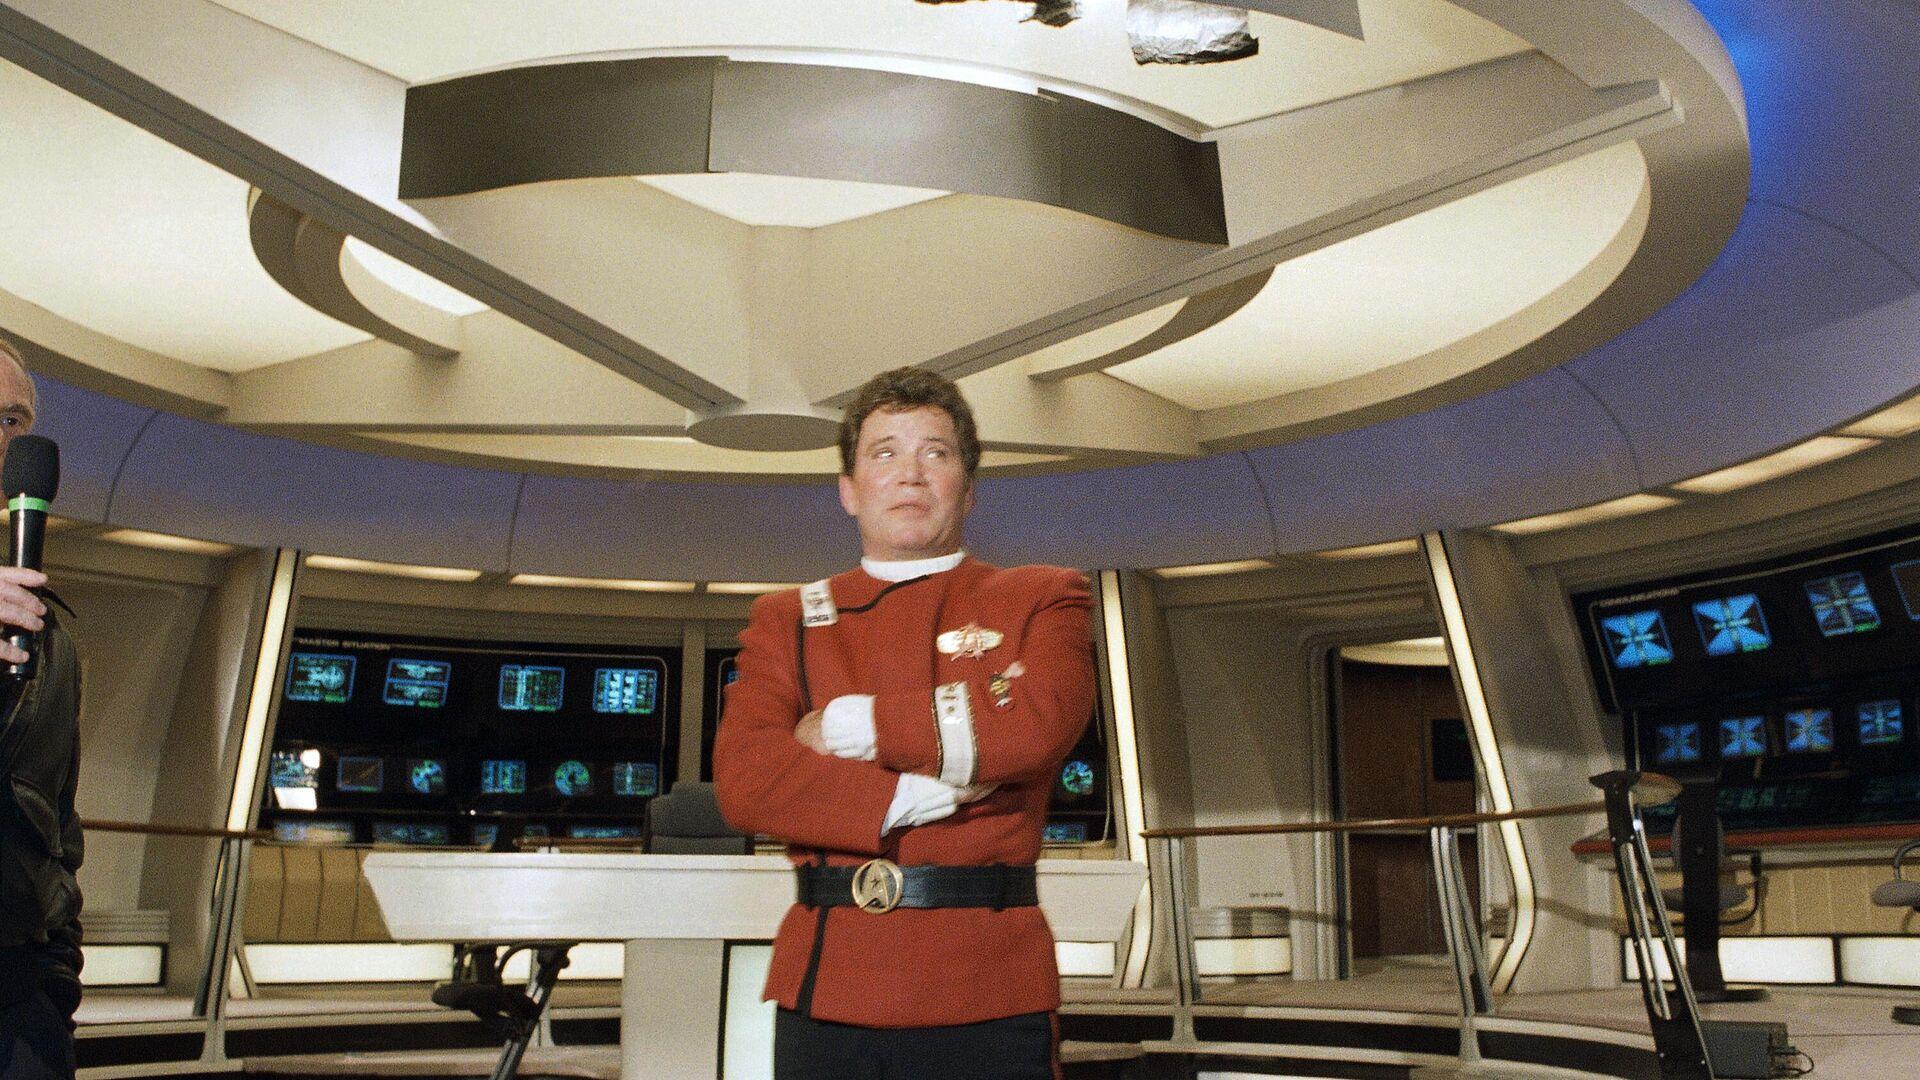 William Shatner en el papel del Capitán Kirk, personaje de la serie televisiva 'Star Trek' - Sputnik Mundo, 1920, 25.09.2021